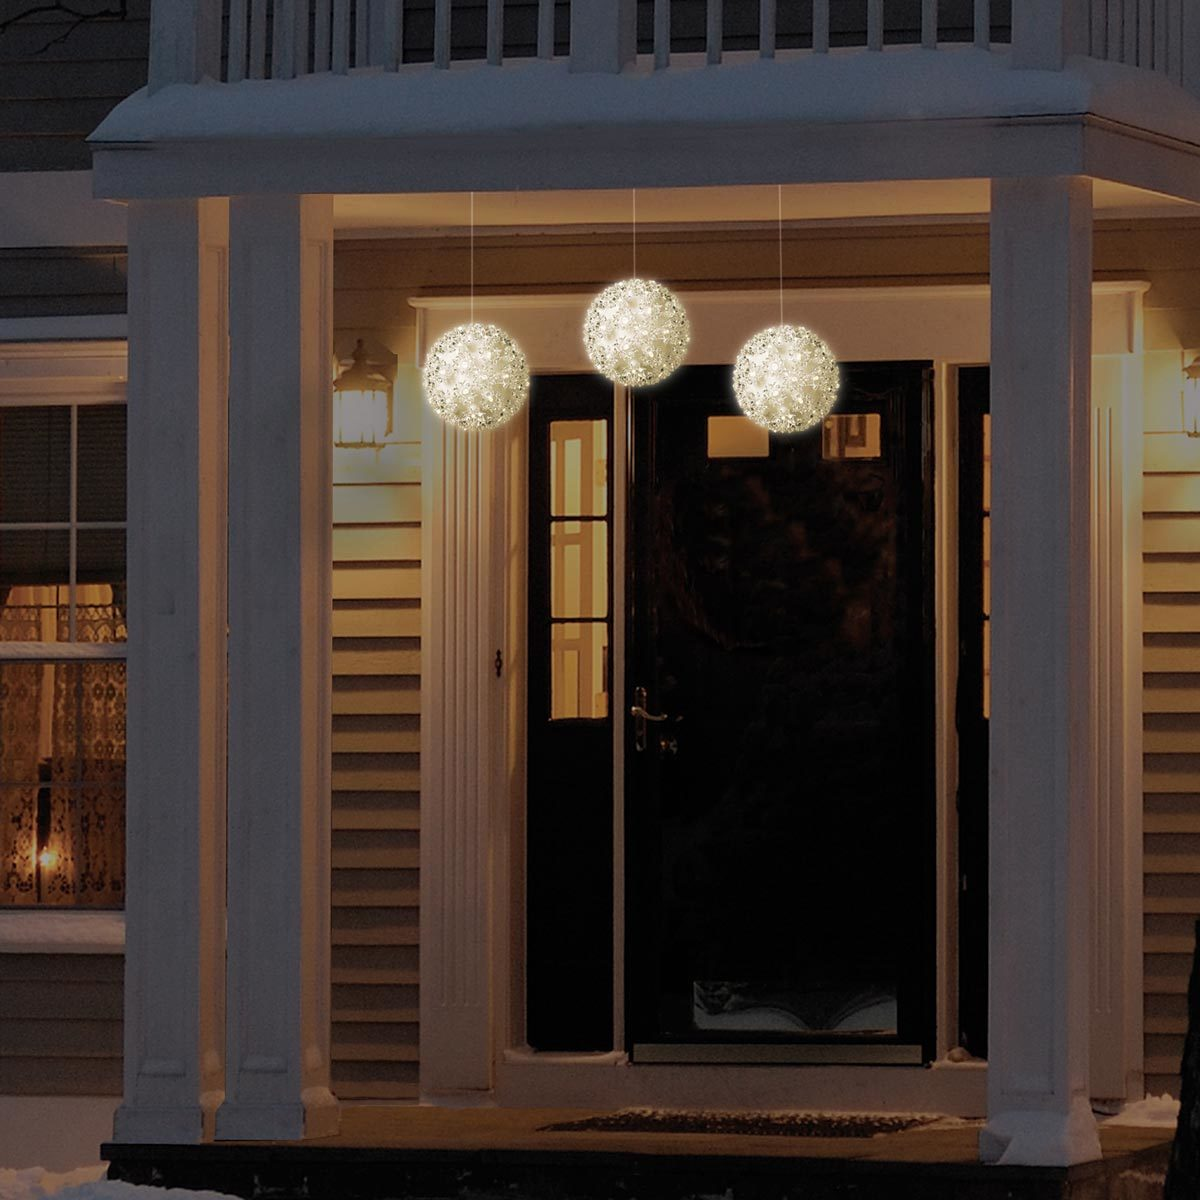 Super Bright White 150 Led Light Sphere Christmas Decoration 3 Pack Costco Uk